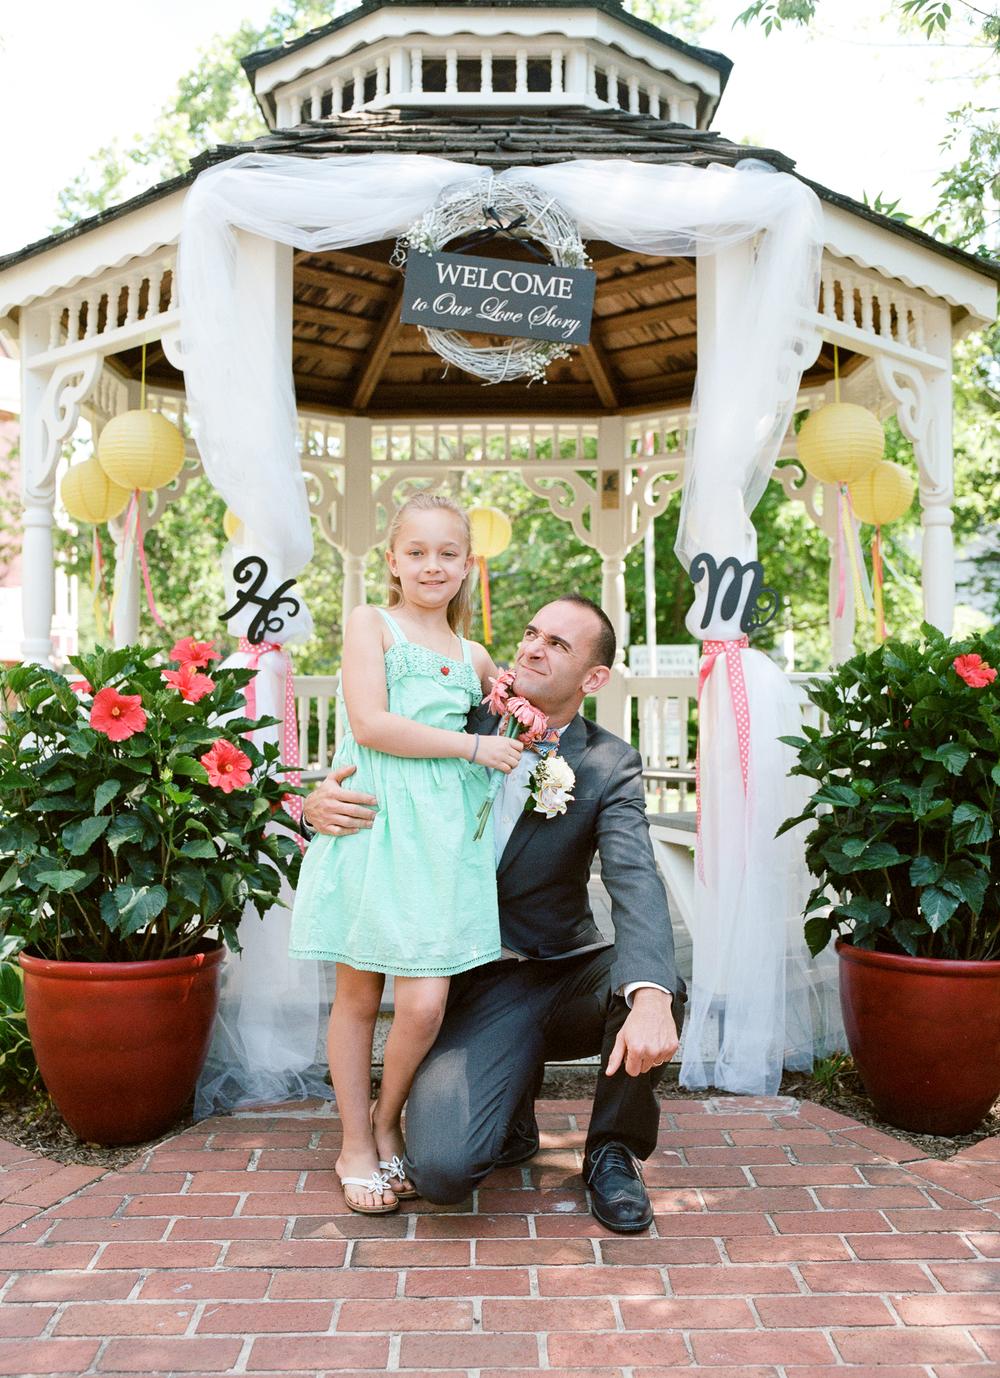 MarkHeather-Occoquan-Virginia-Wedding-38.jpg